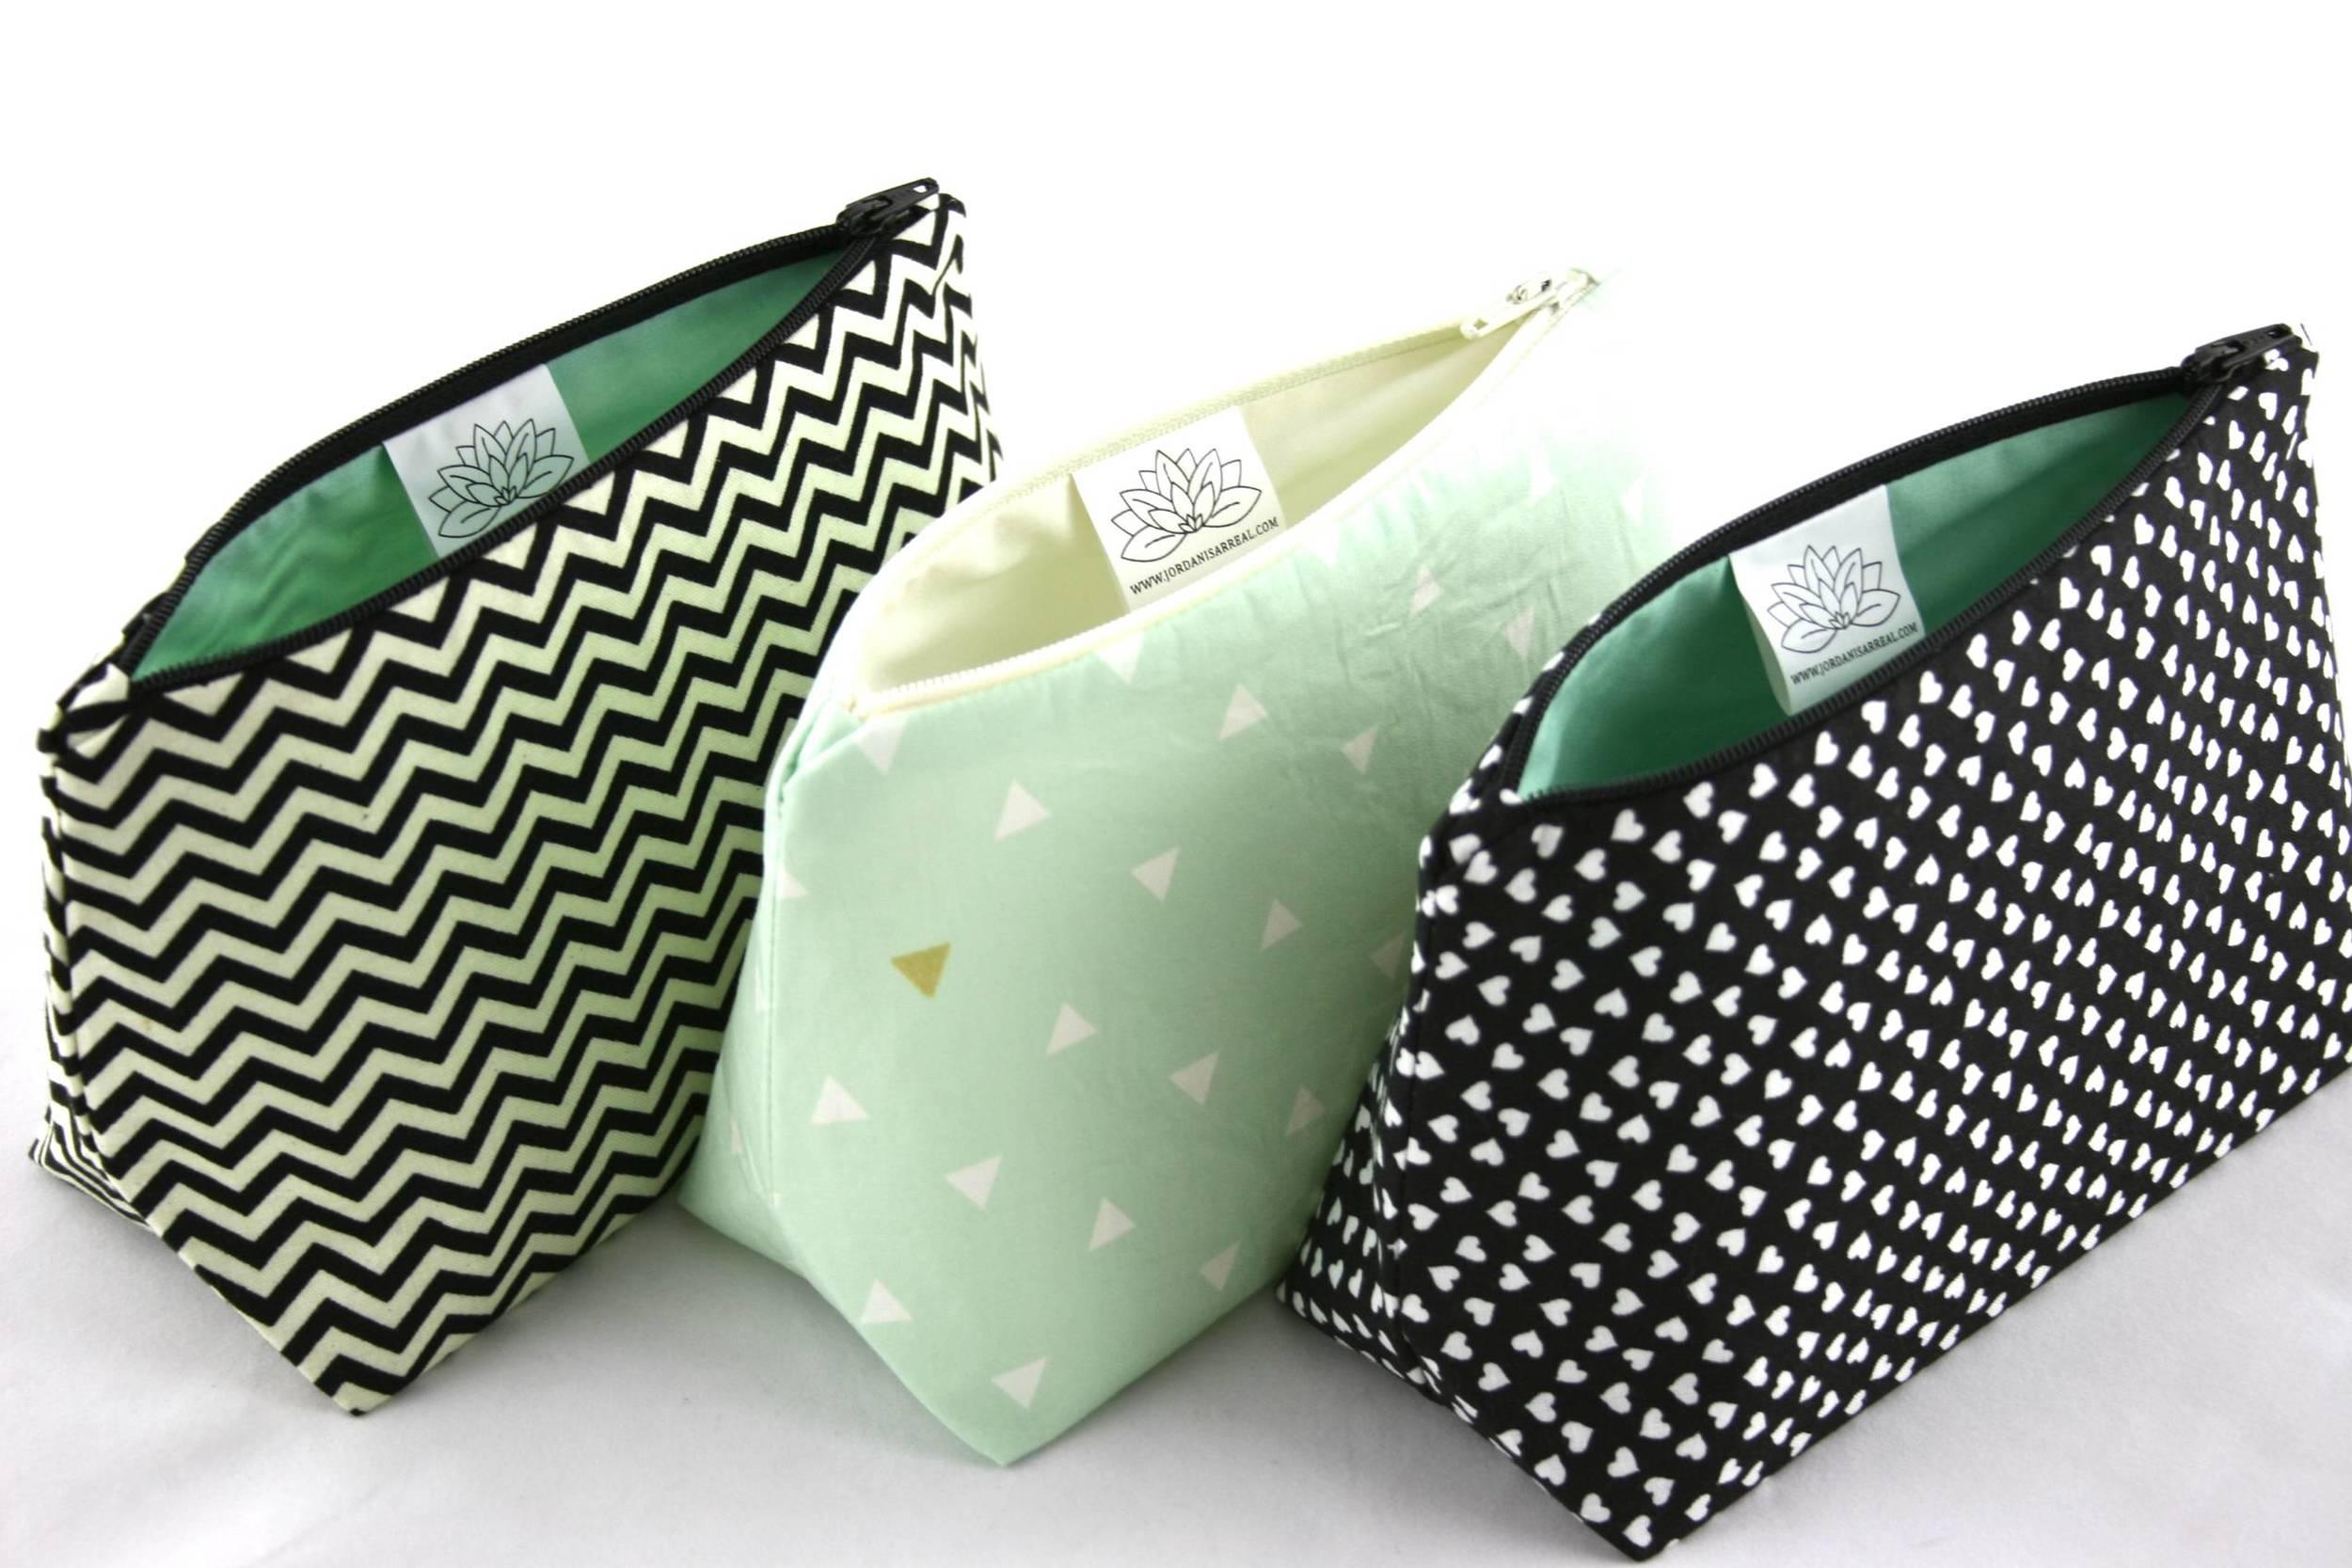 Black & Mint Green Coordinate Bags - Le Pique Nique by Jordani Sarreal 02.jpg